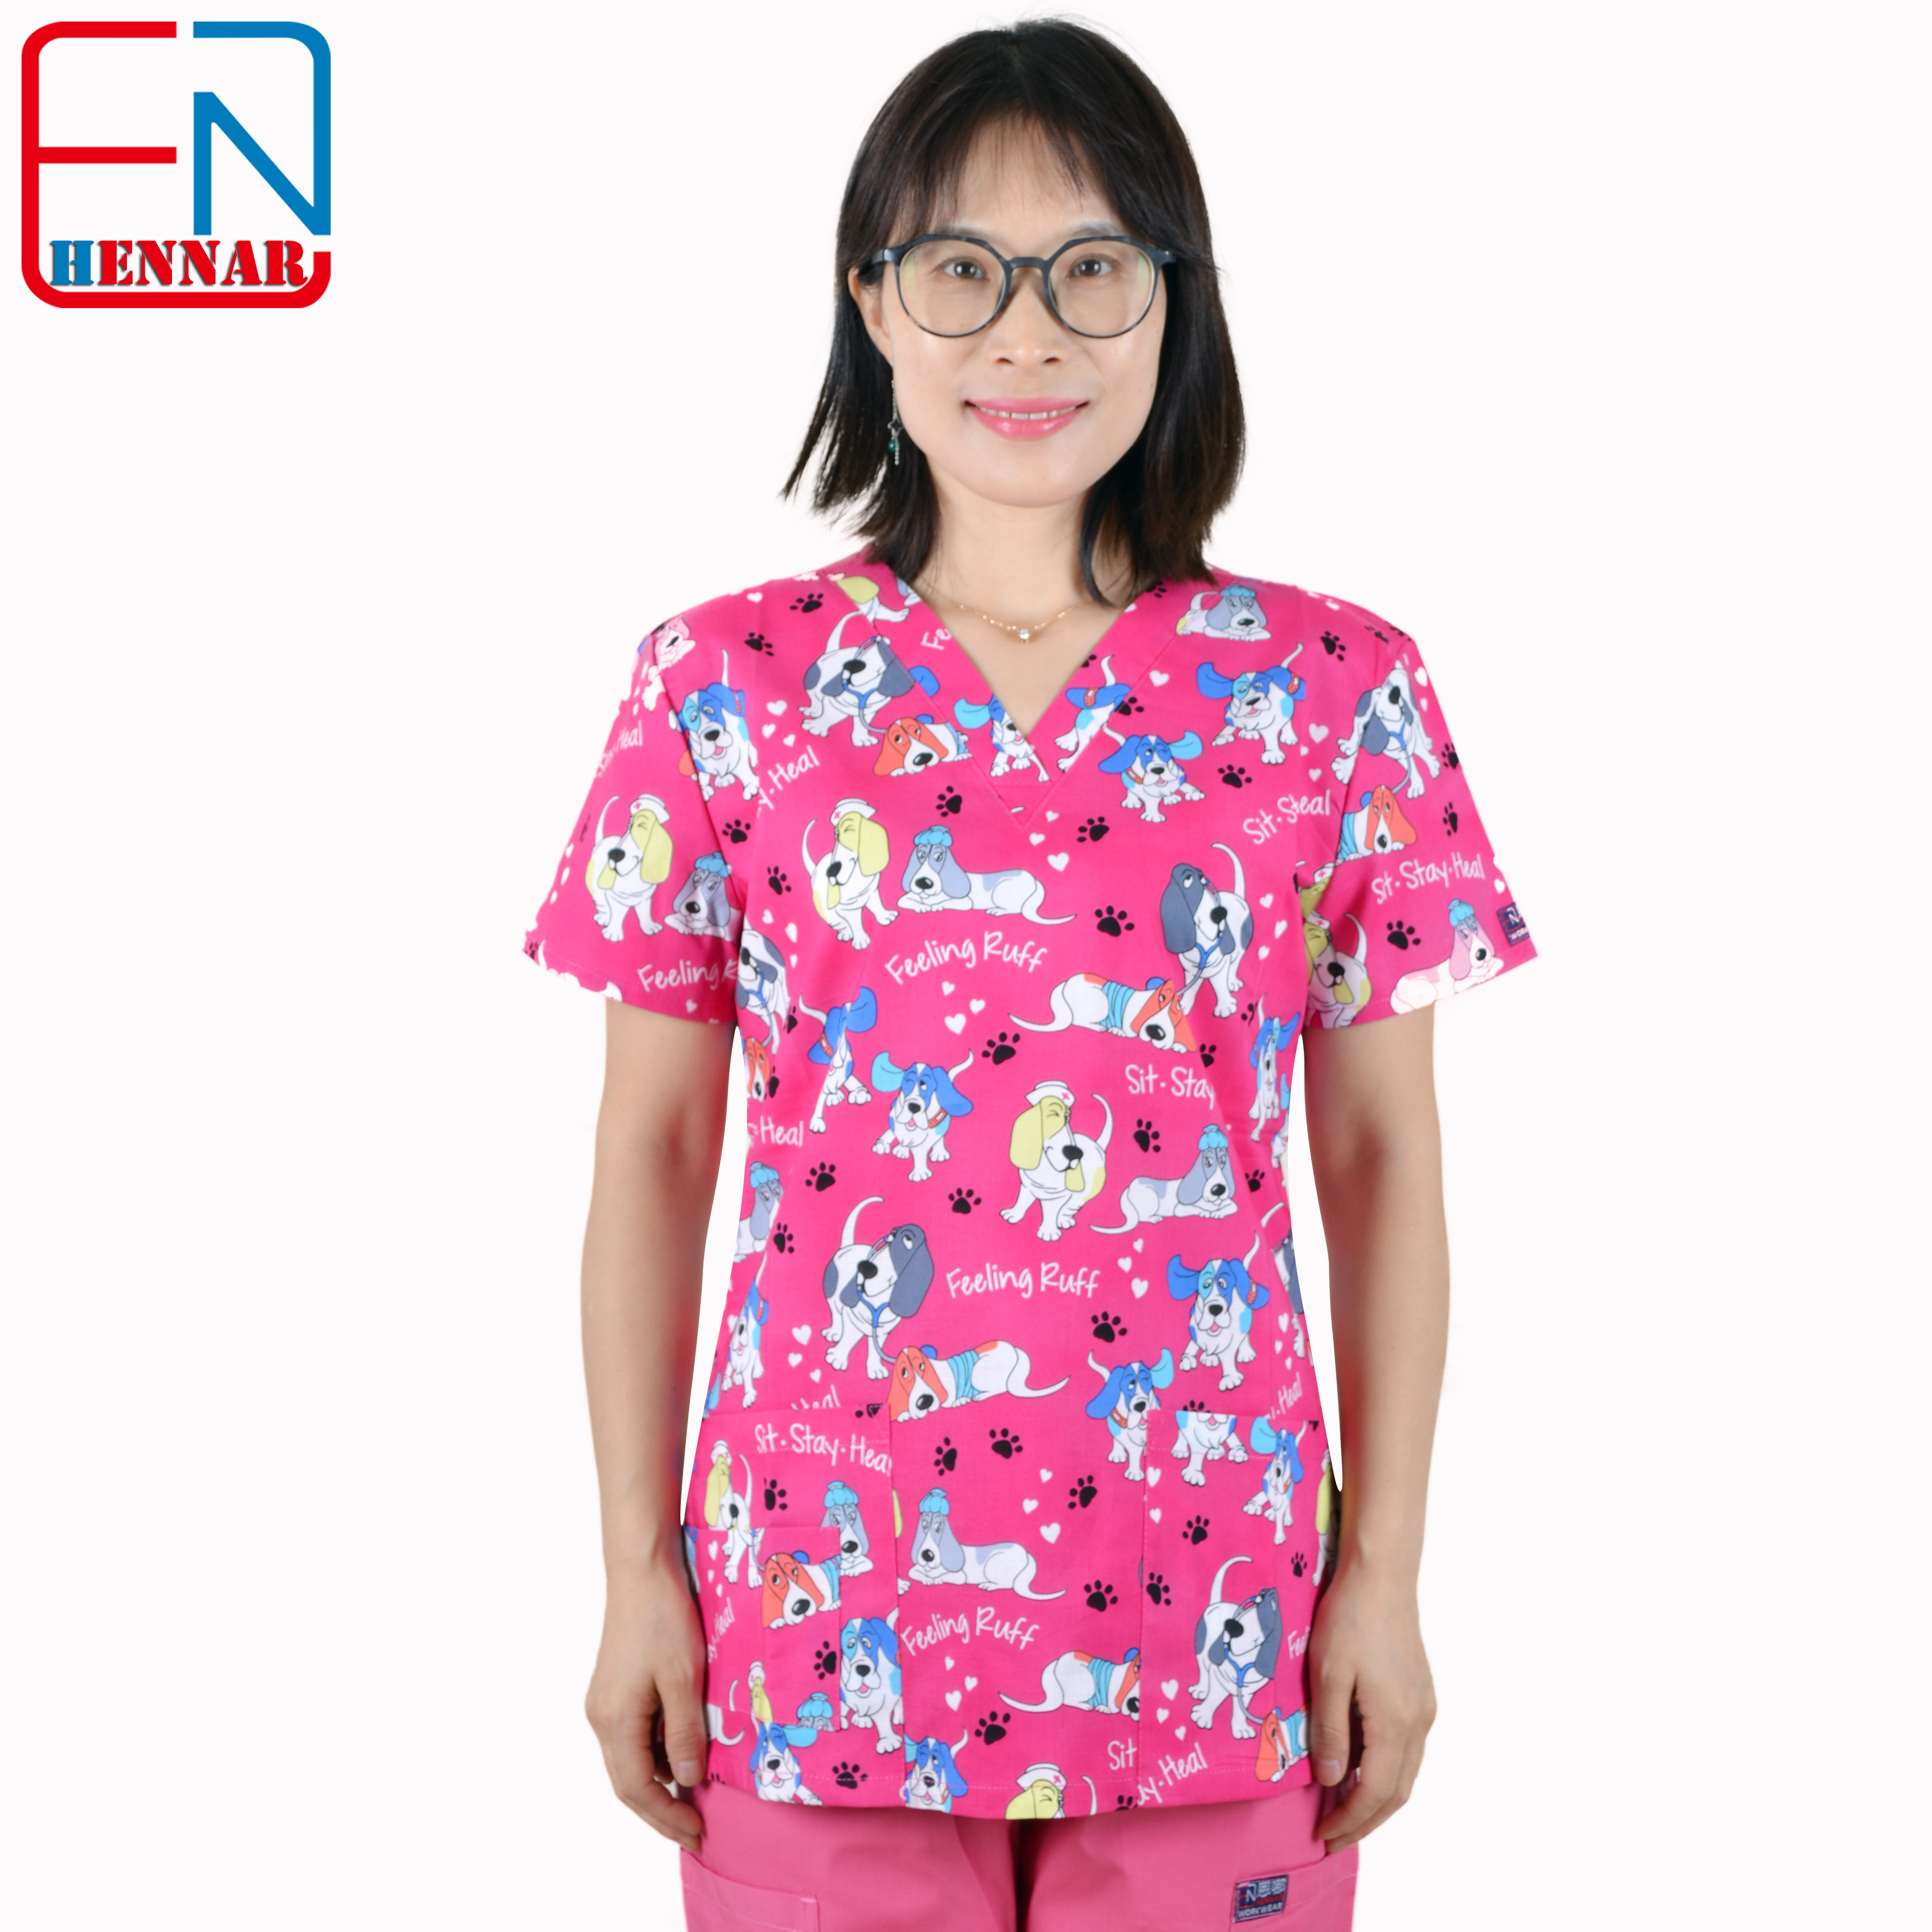 Hennar  Medical Scrubs  Nursing Scrubs  Women Scrubs  Nurse Medical  Uniformes Medicos Para Mujer  Scrub Tops